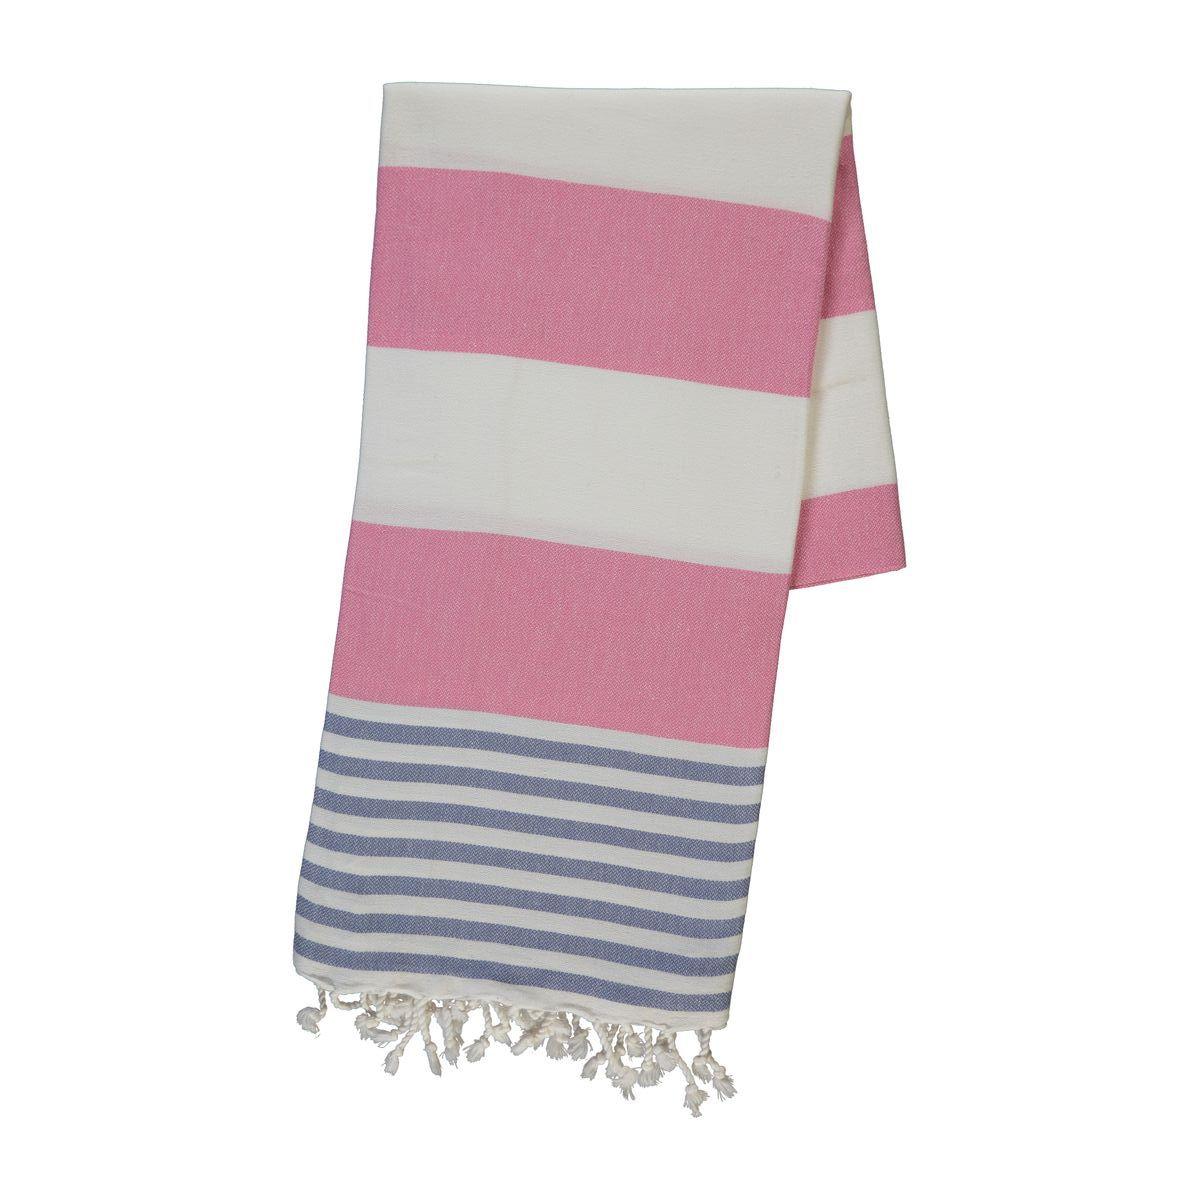 Peshtemal Ladon03 - Jean Blue / Pink